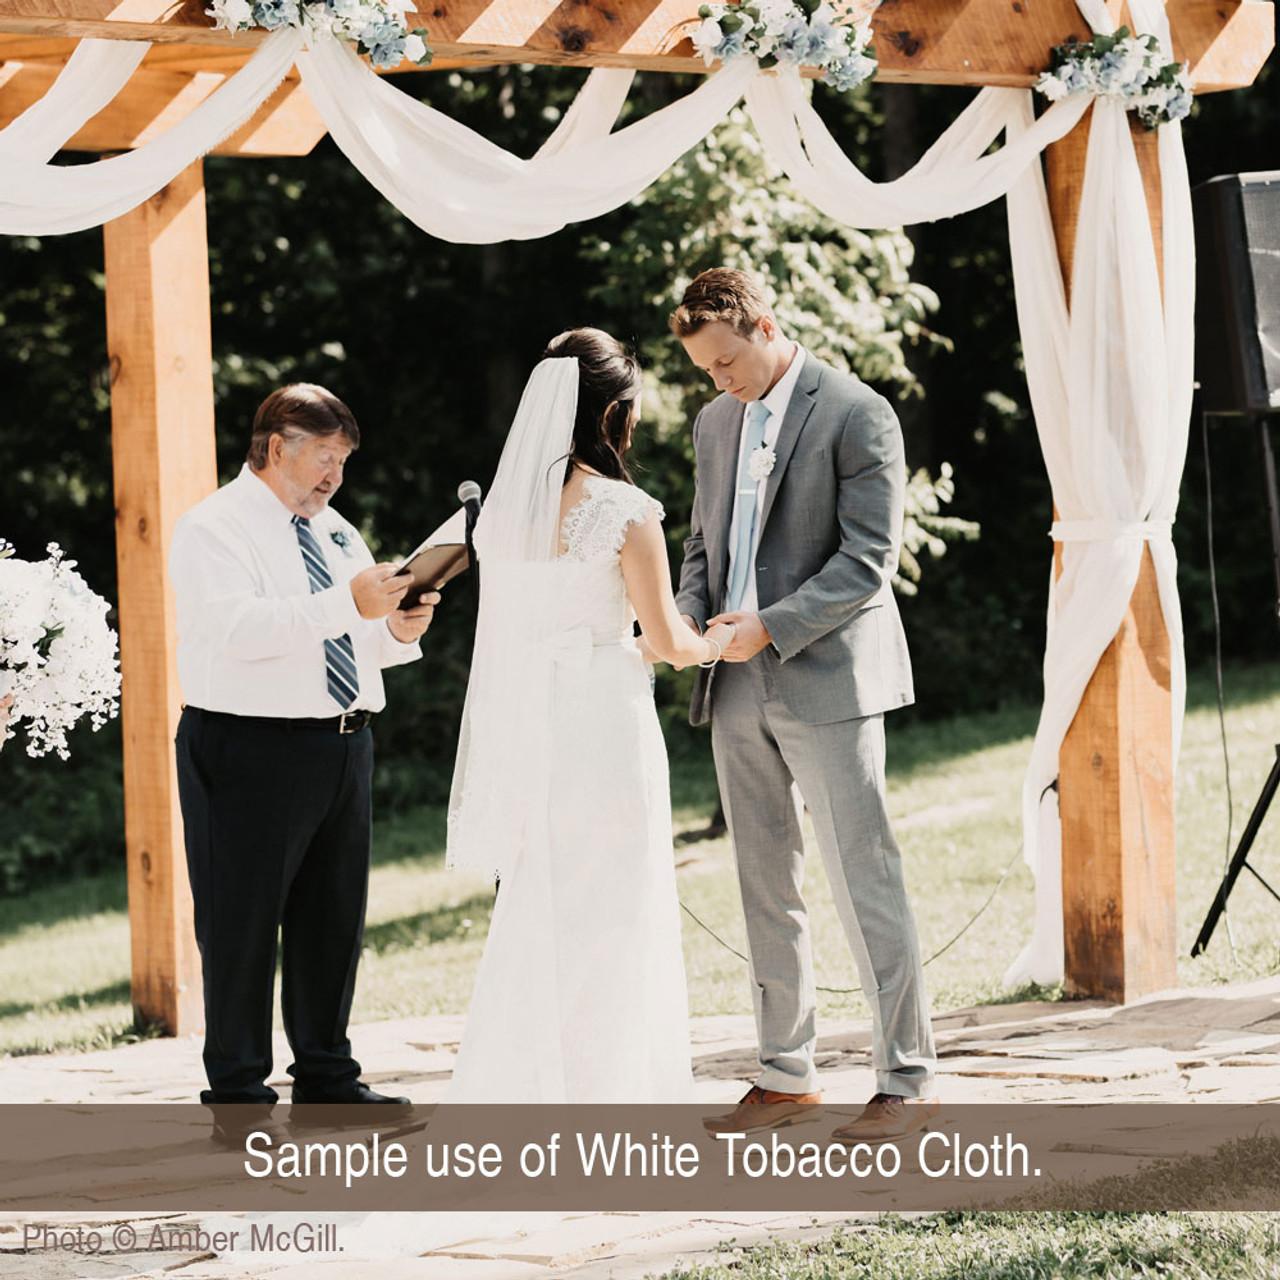 10 Yards White Tobacco Cloth Cotton Fabric - Lightweight